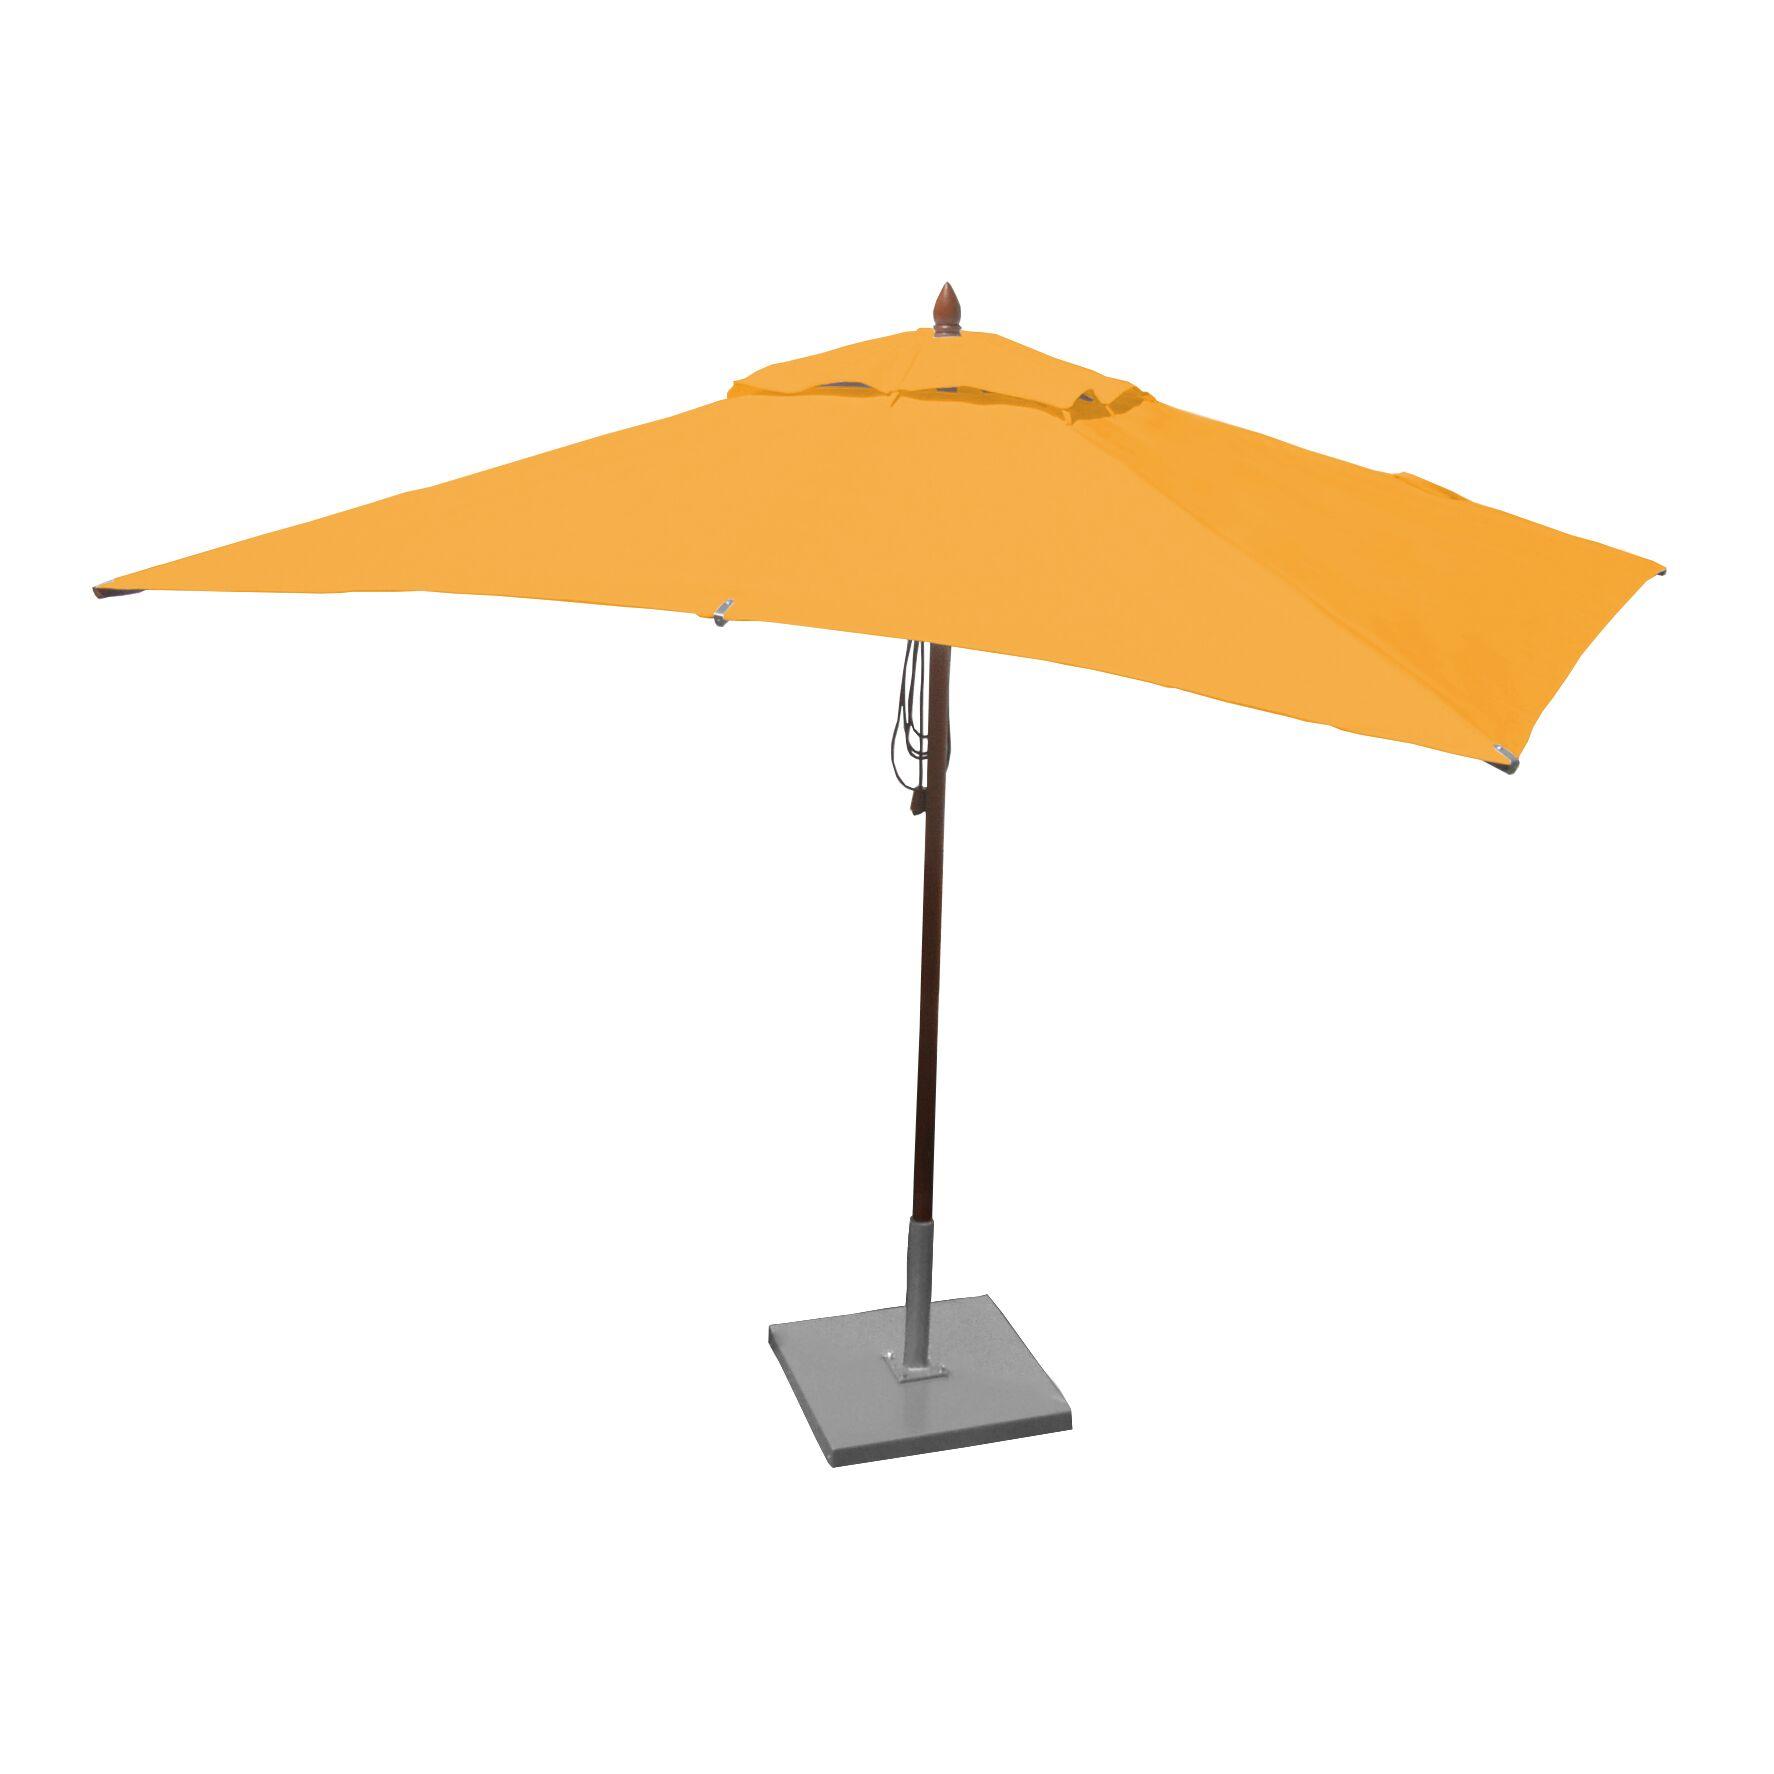 10' X 6.5' Rectangular Market Umbrella Fabric: Sunflower Yellow